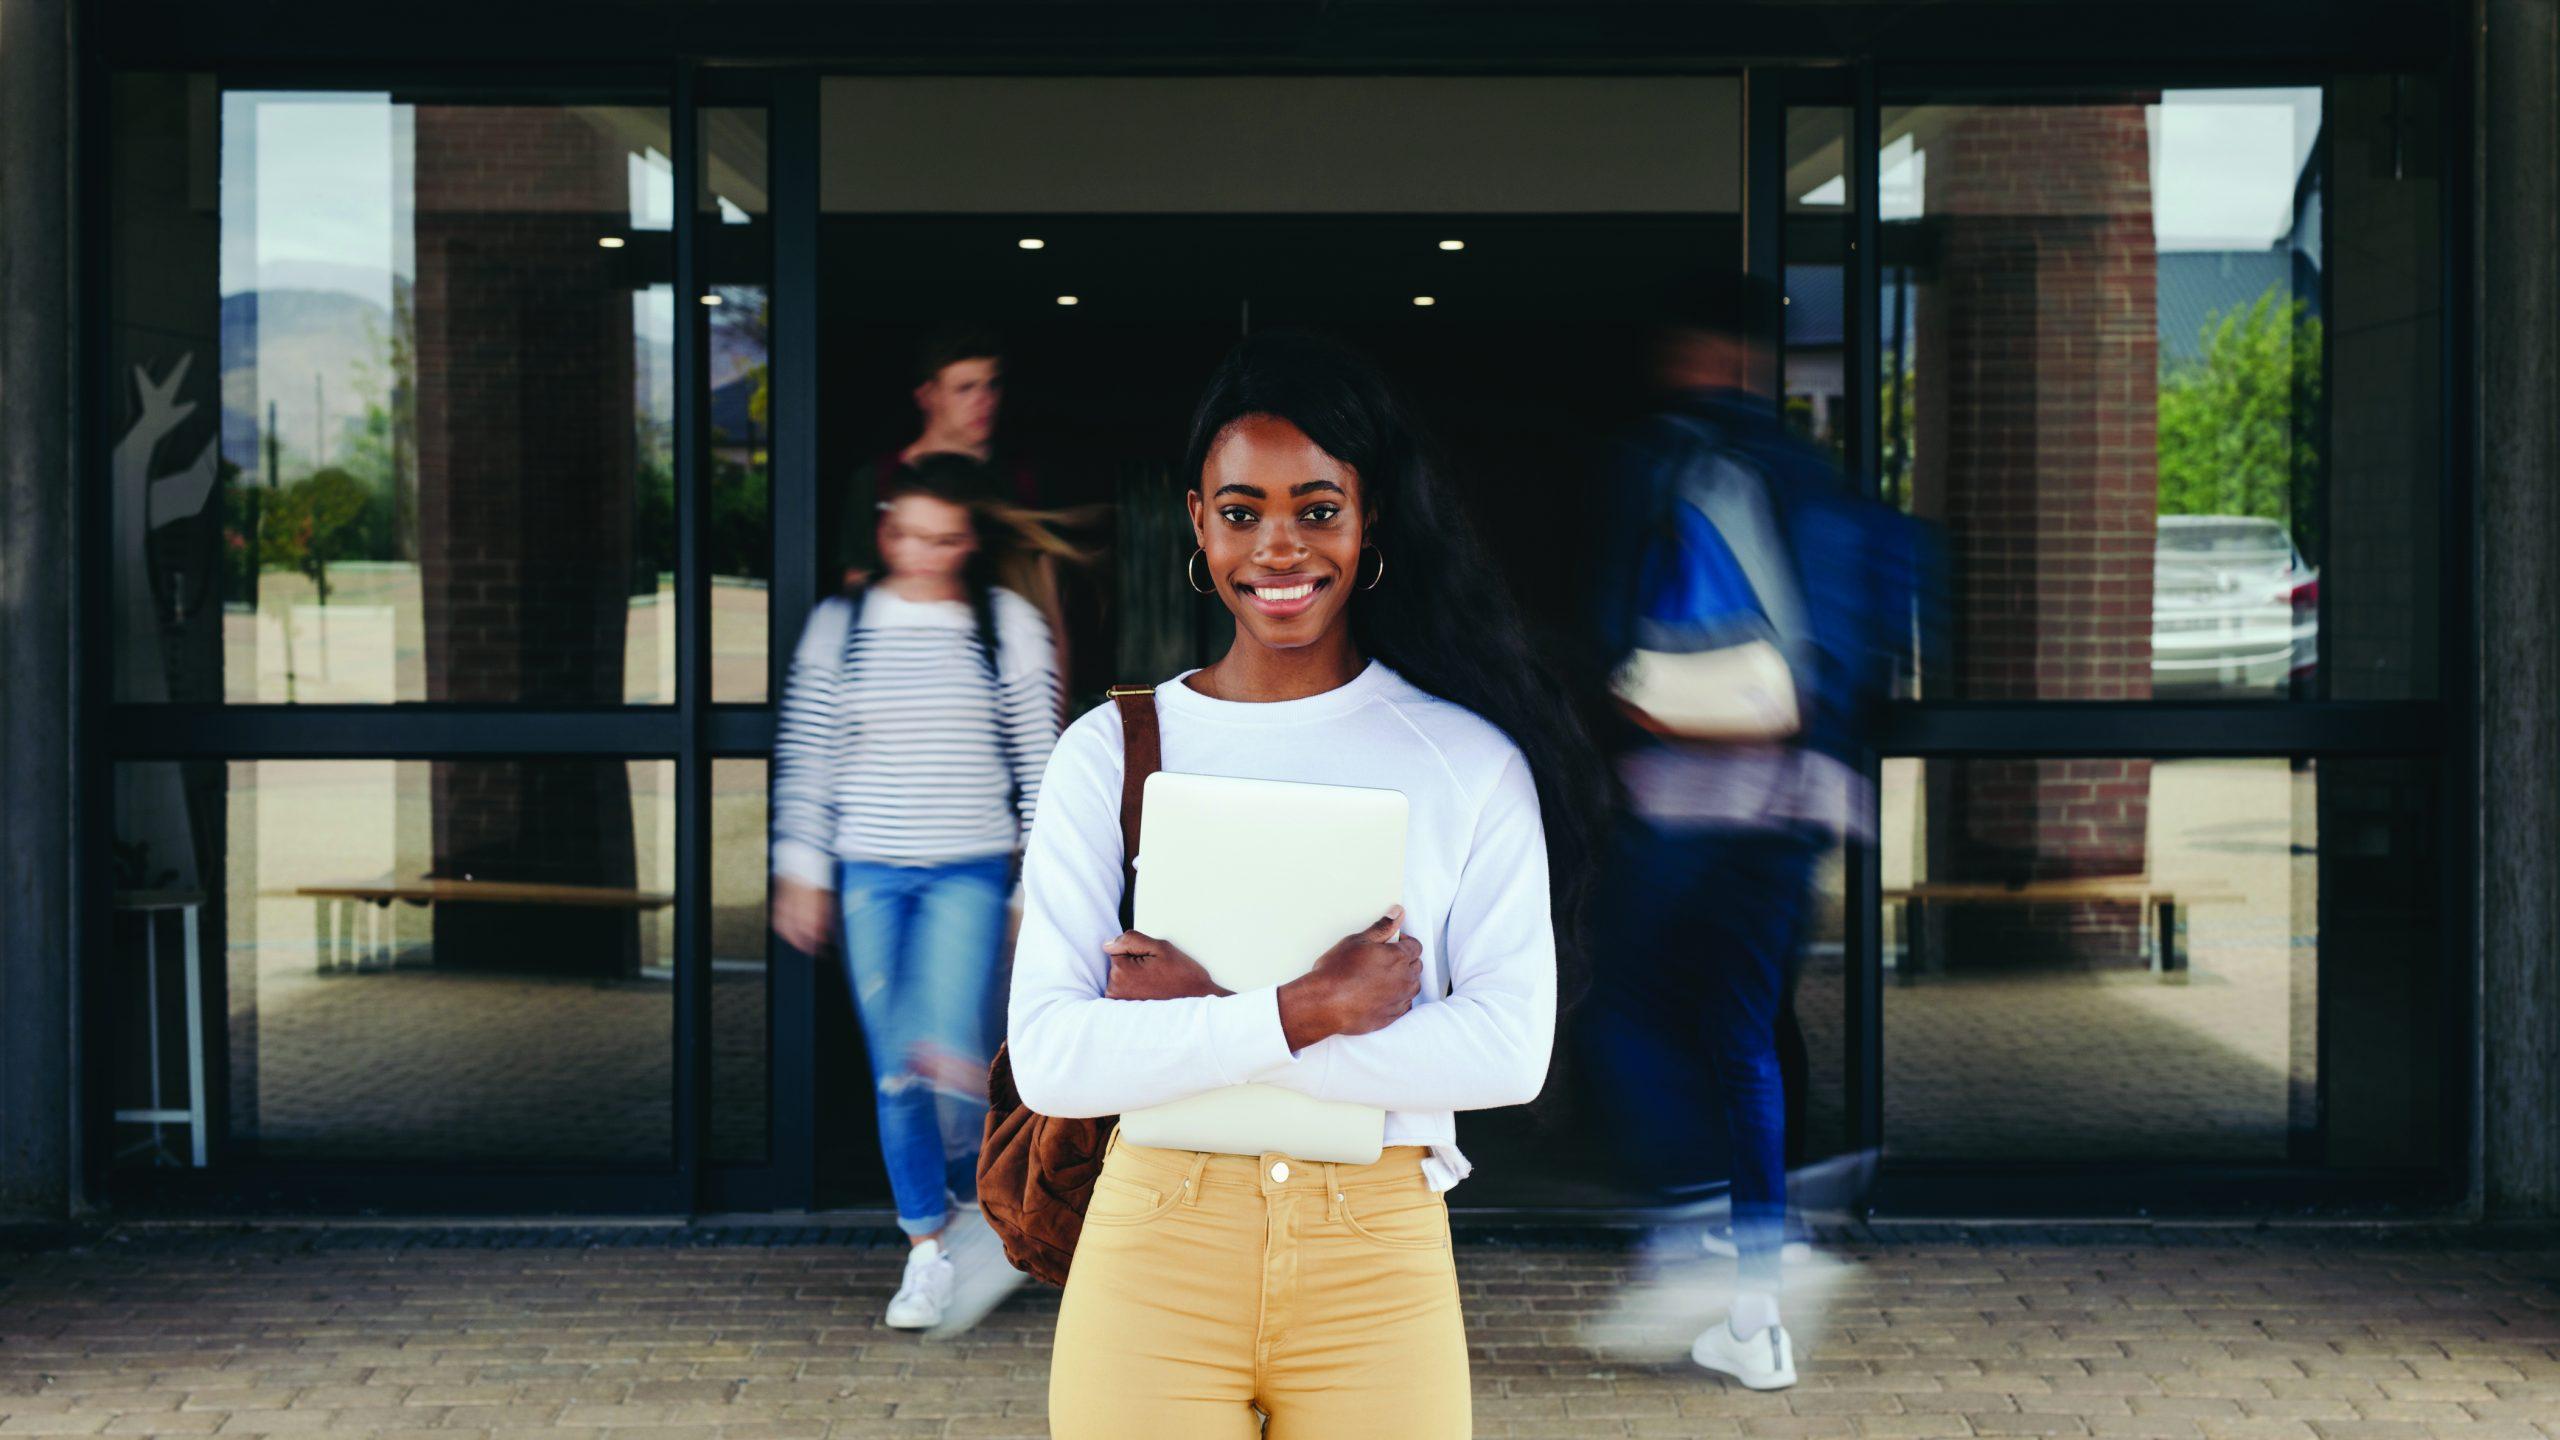 Female student at university campus